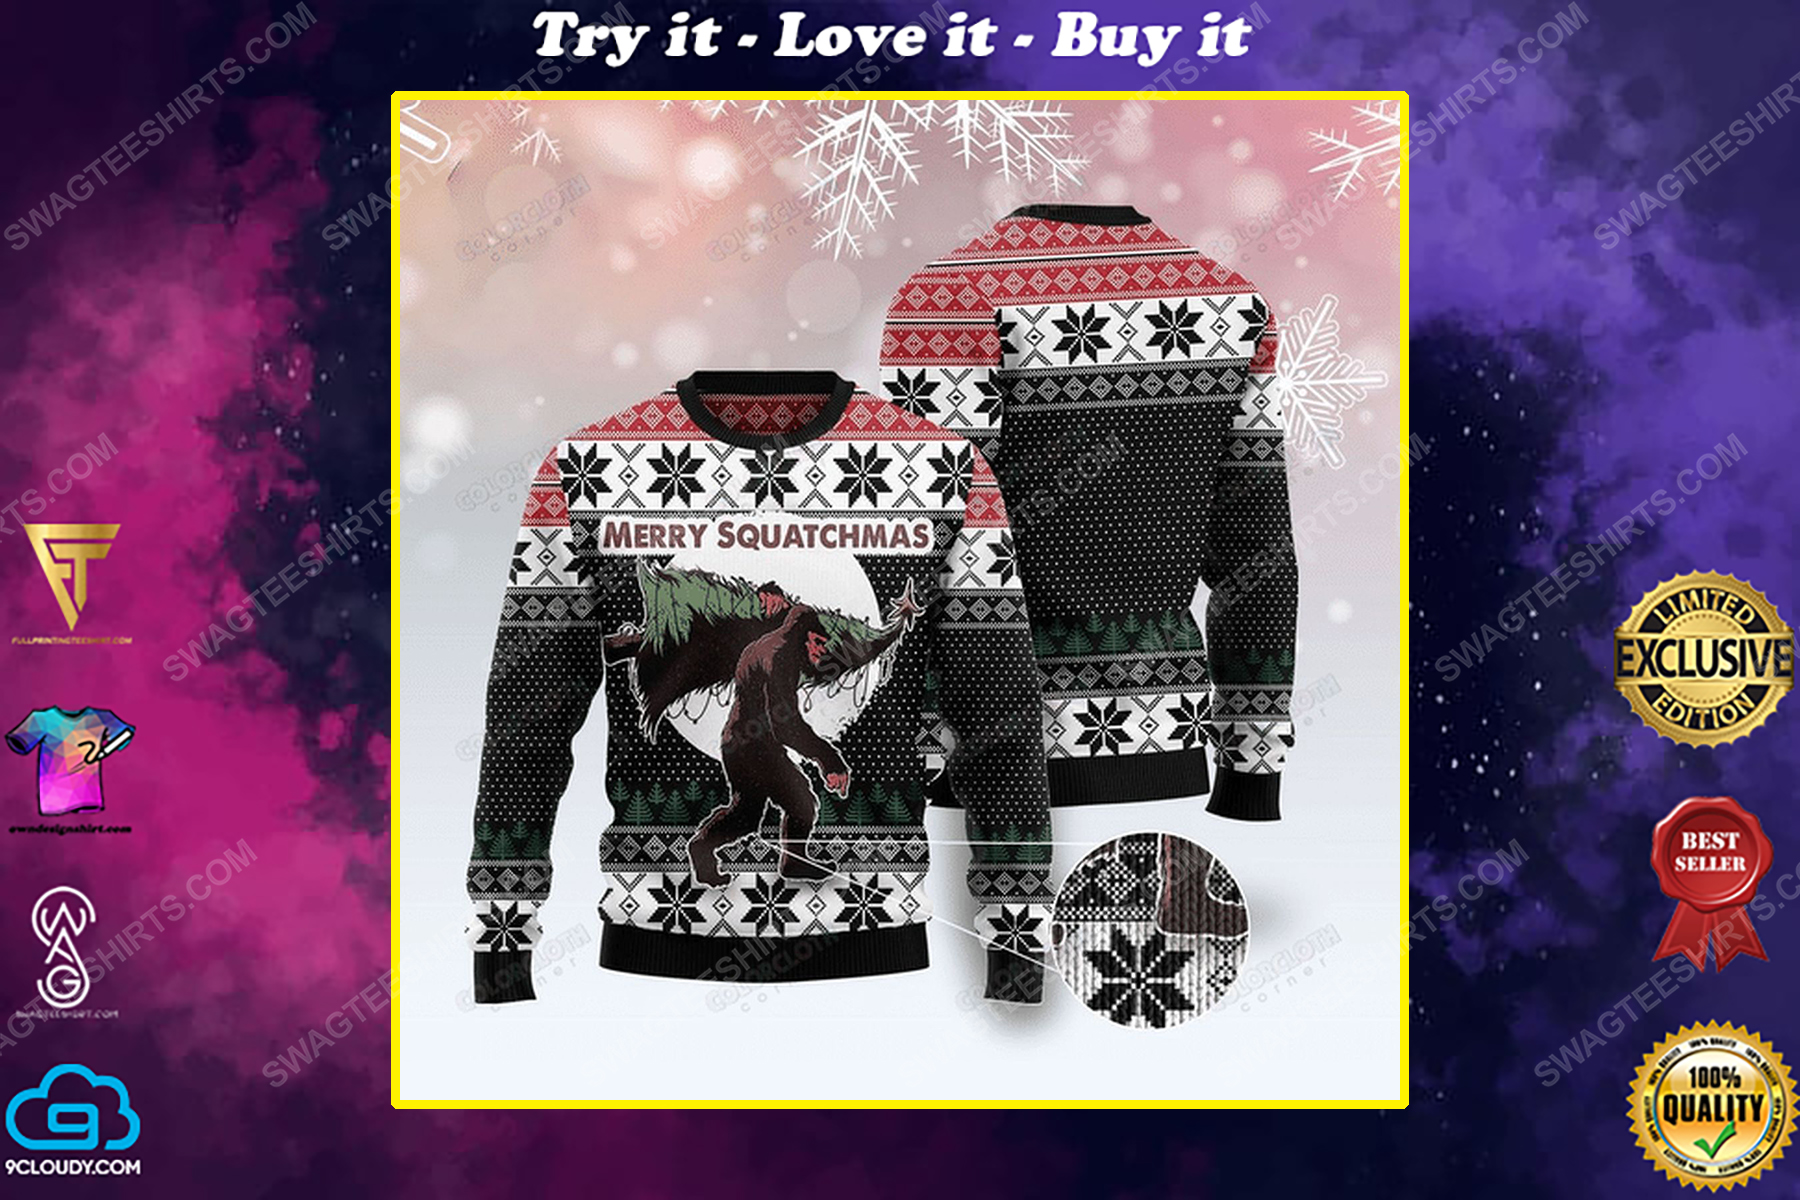 Bigfoot merry squatchmas christmas tree ugly christmas sweater 1